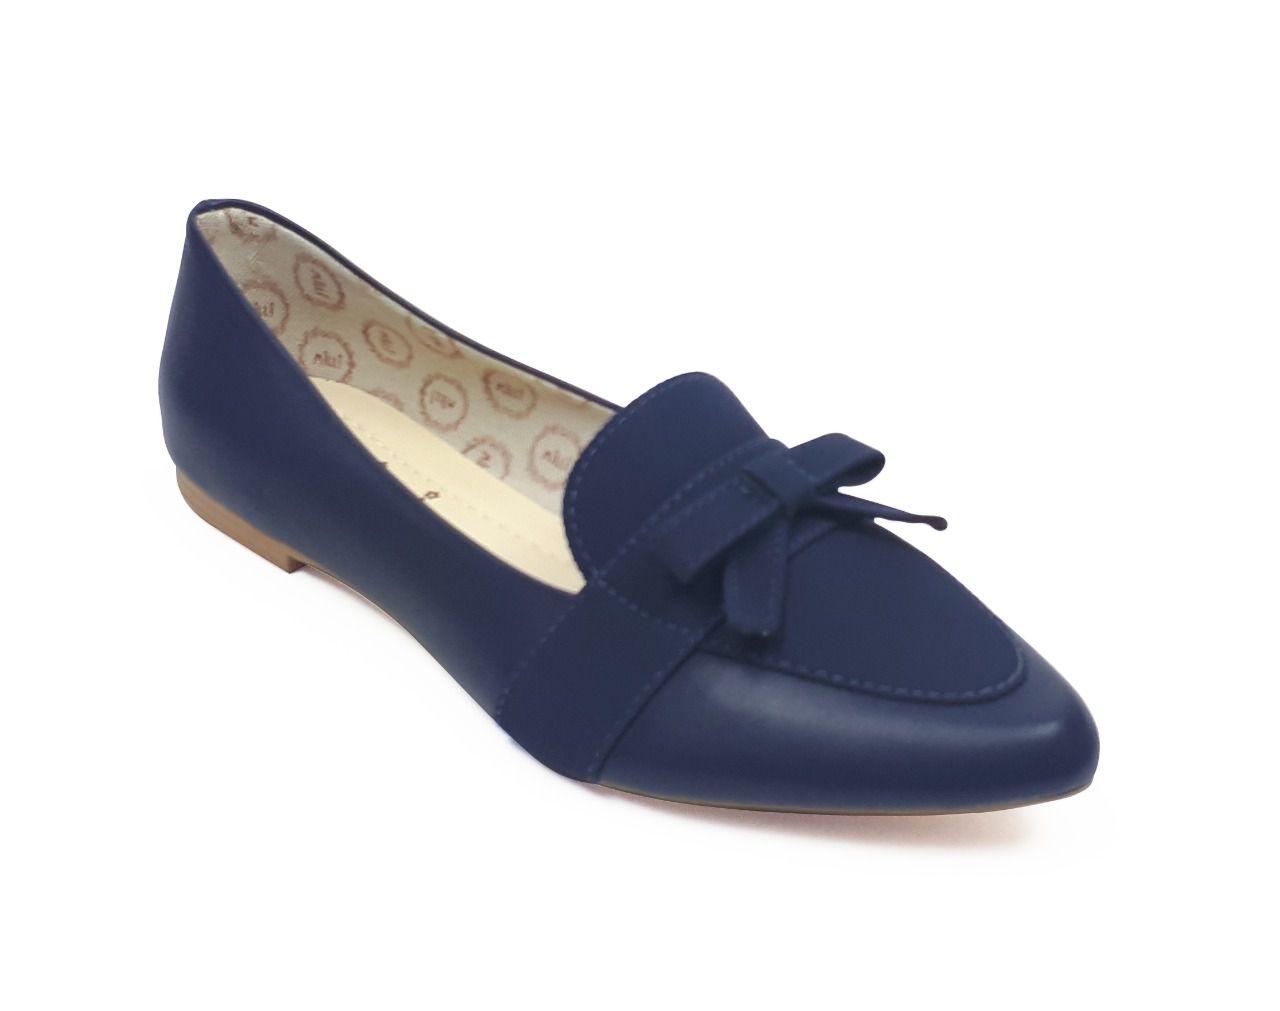 Sapatilha Milli estilo mocassim em sintético azul